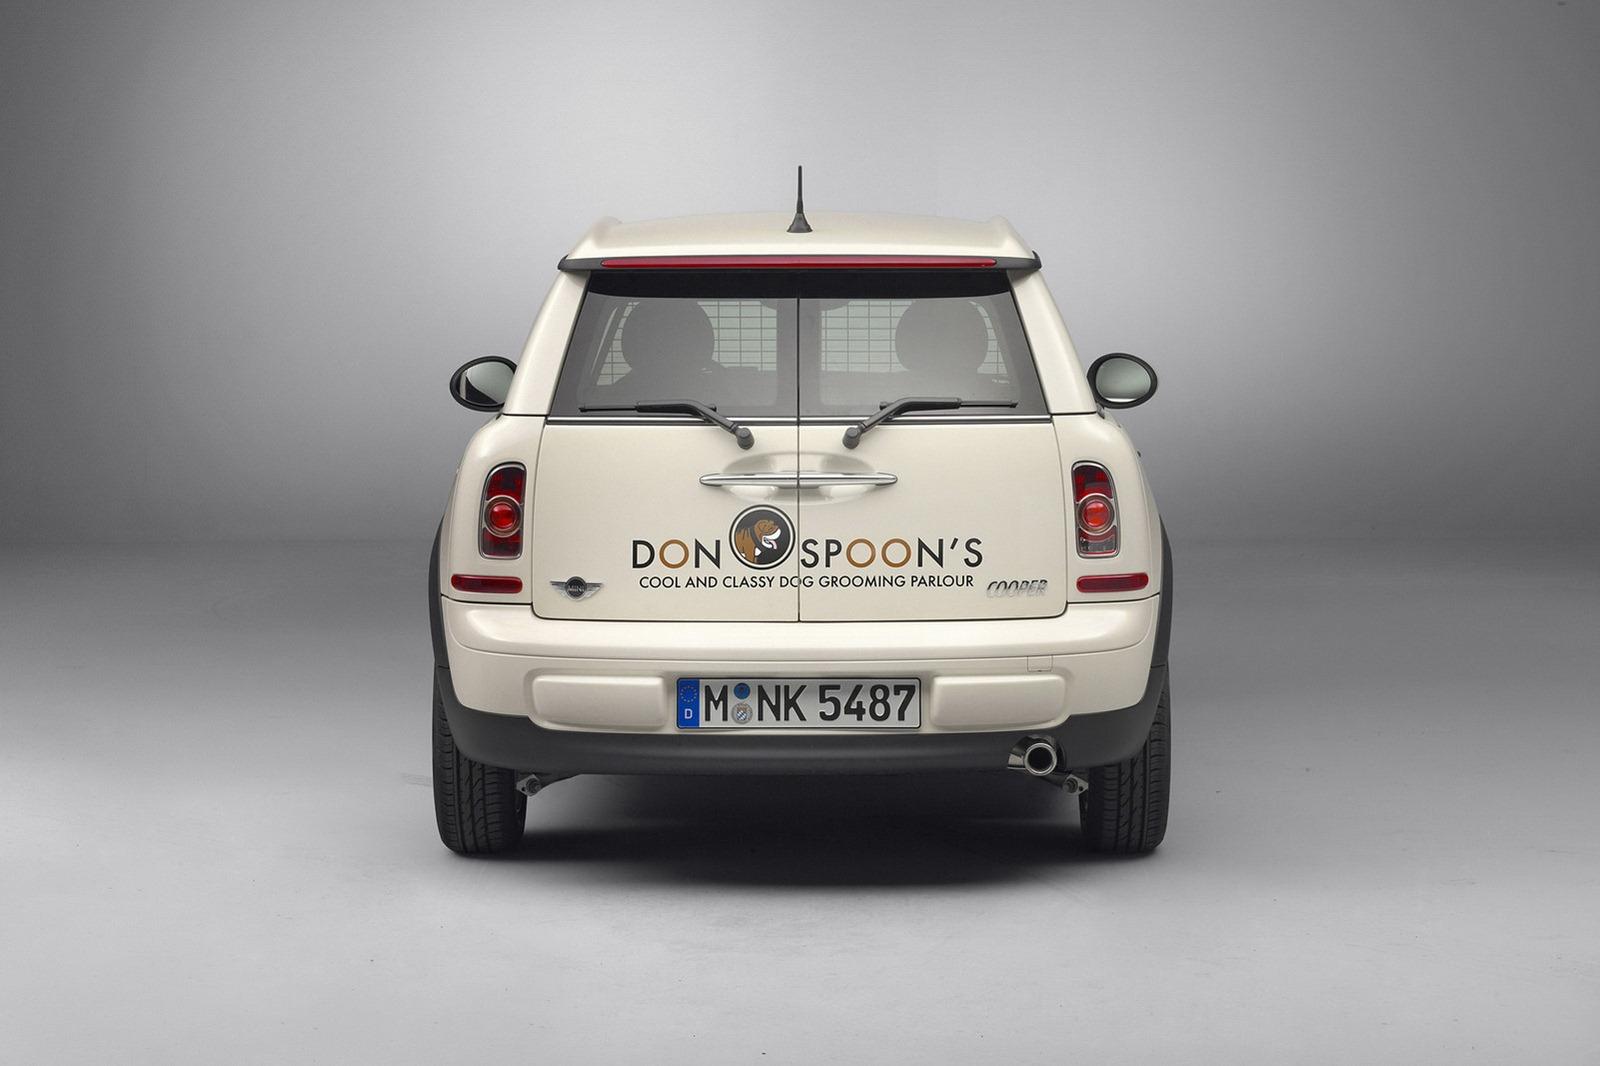 2013-Mini-Clubvan-Production-Model-6.jpg?imgmax=1800